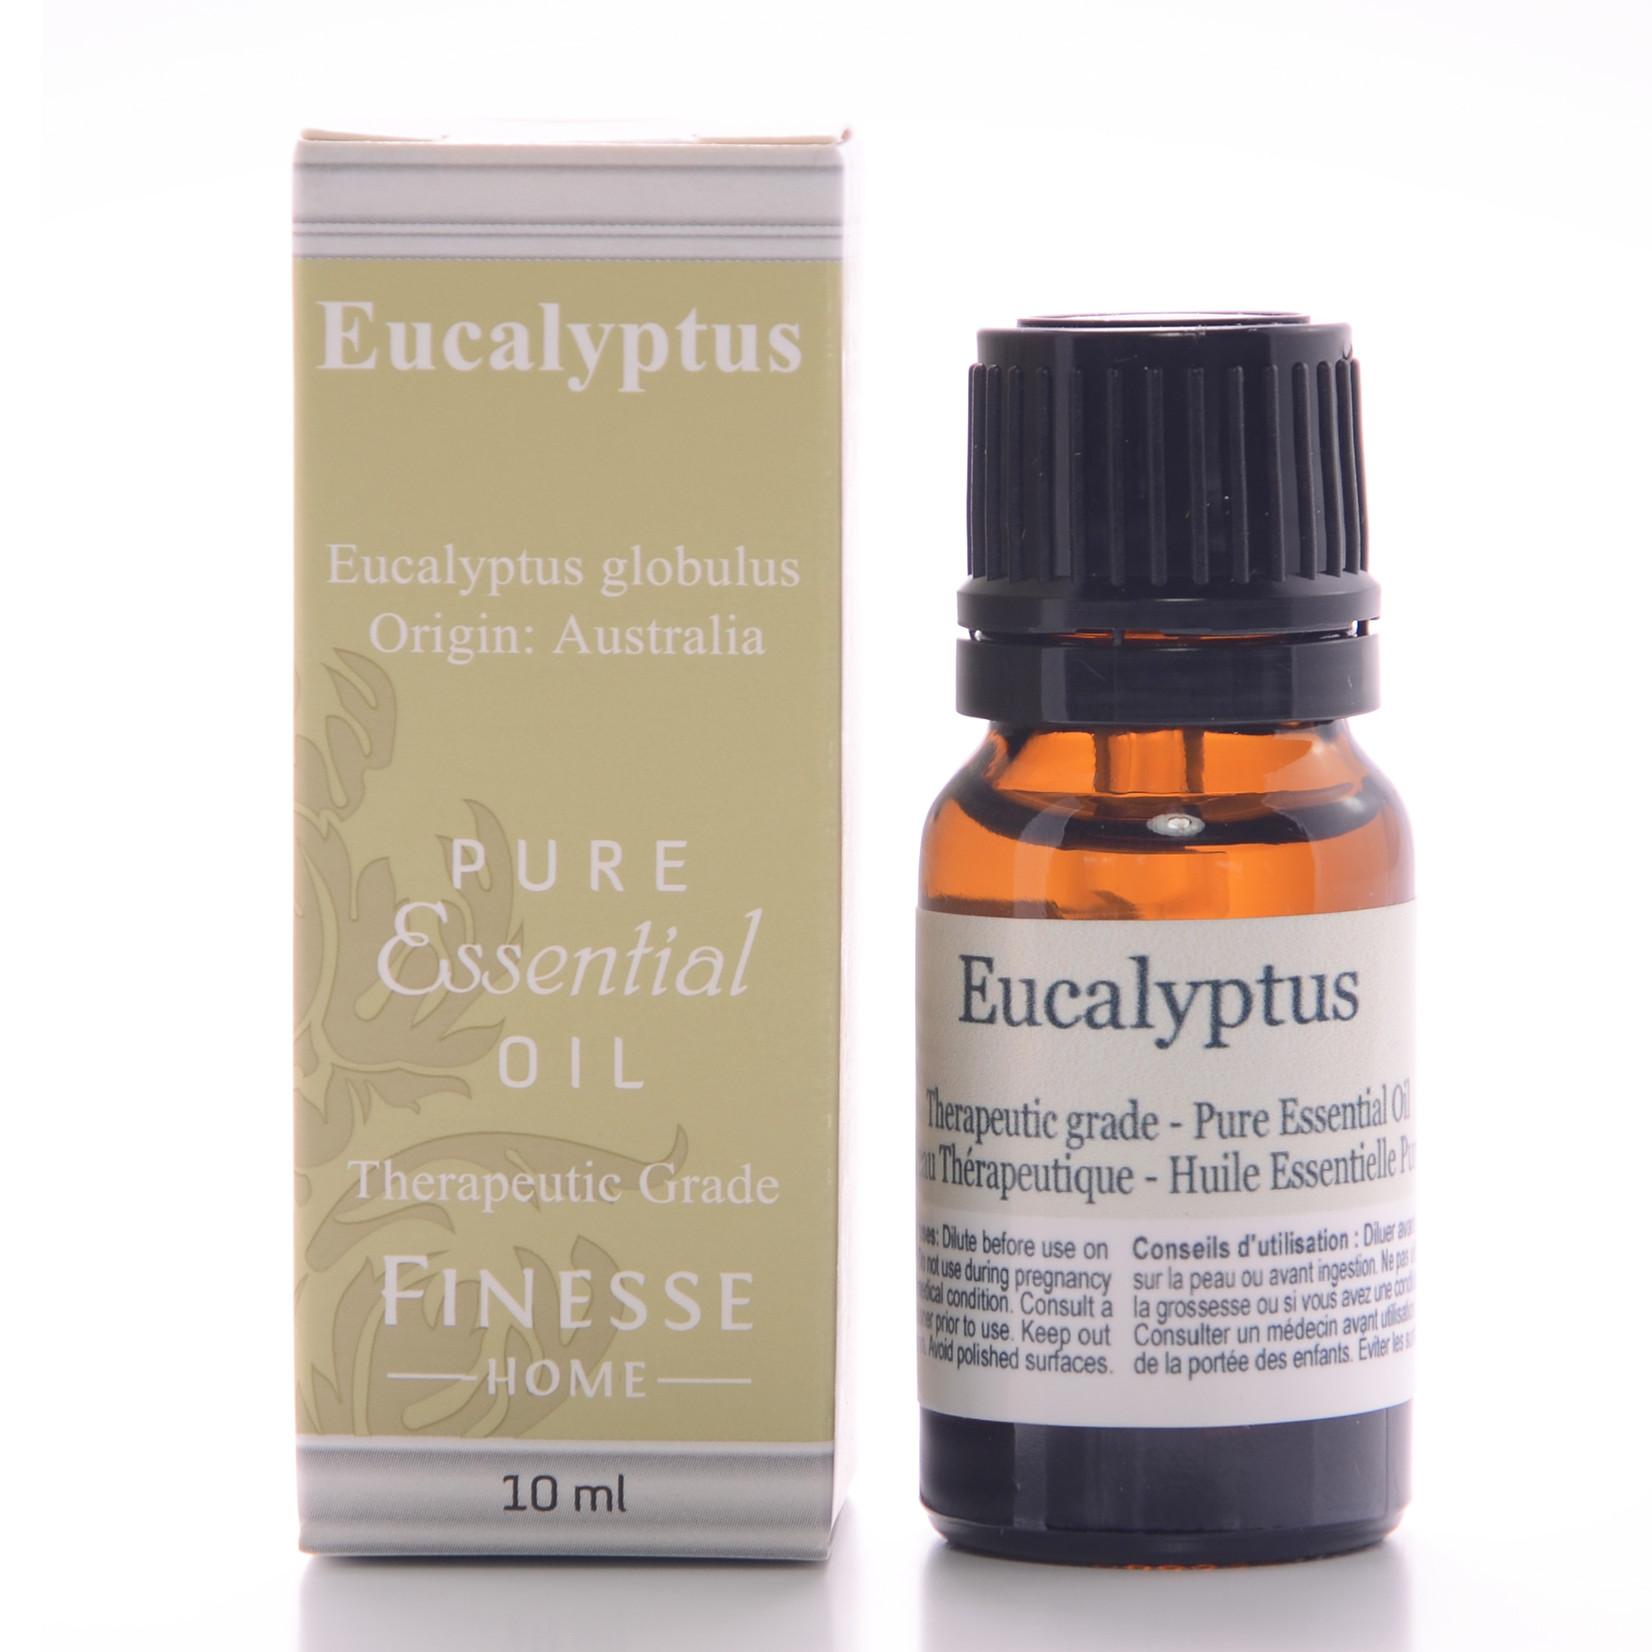 Finesse Home ~ Eucalyptus Essential Oil